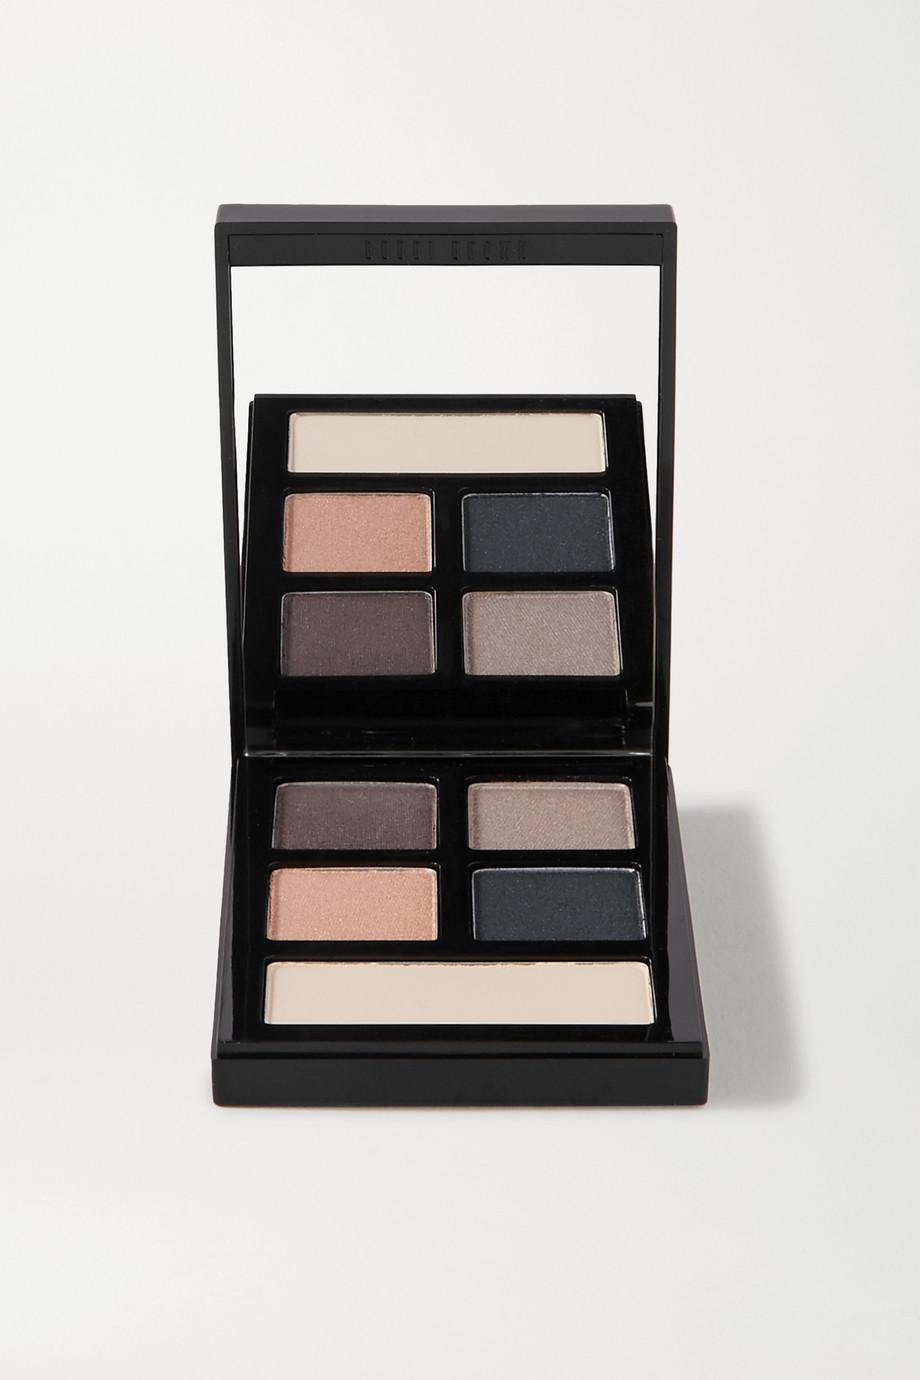 Bobbi Brown The Essential Multicolor Eye Shadow Palette - Night Smoke